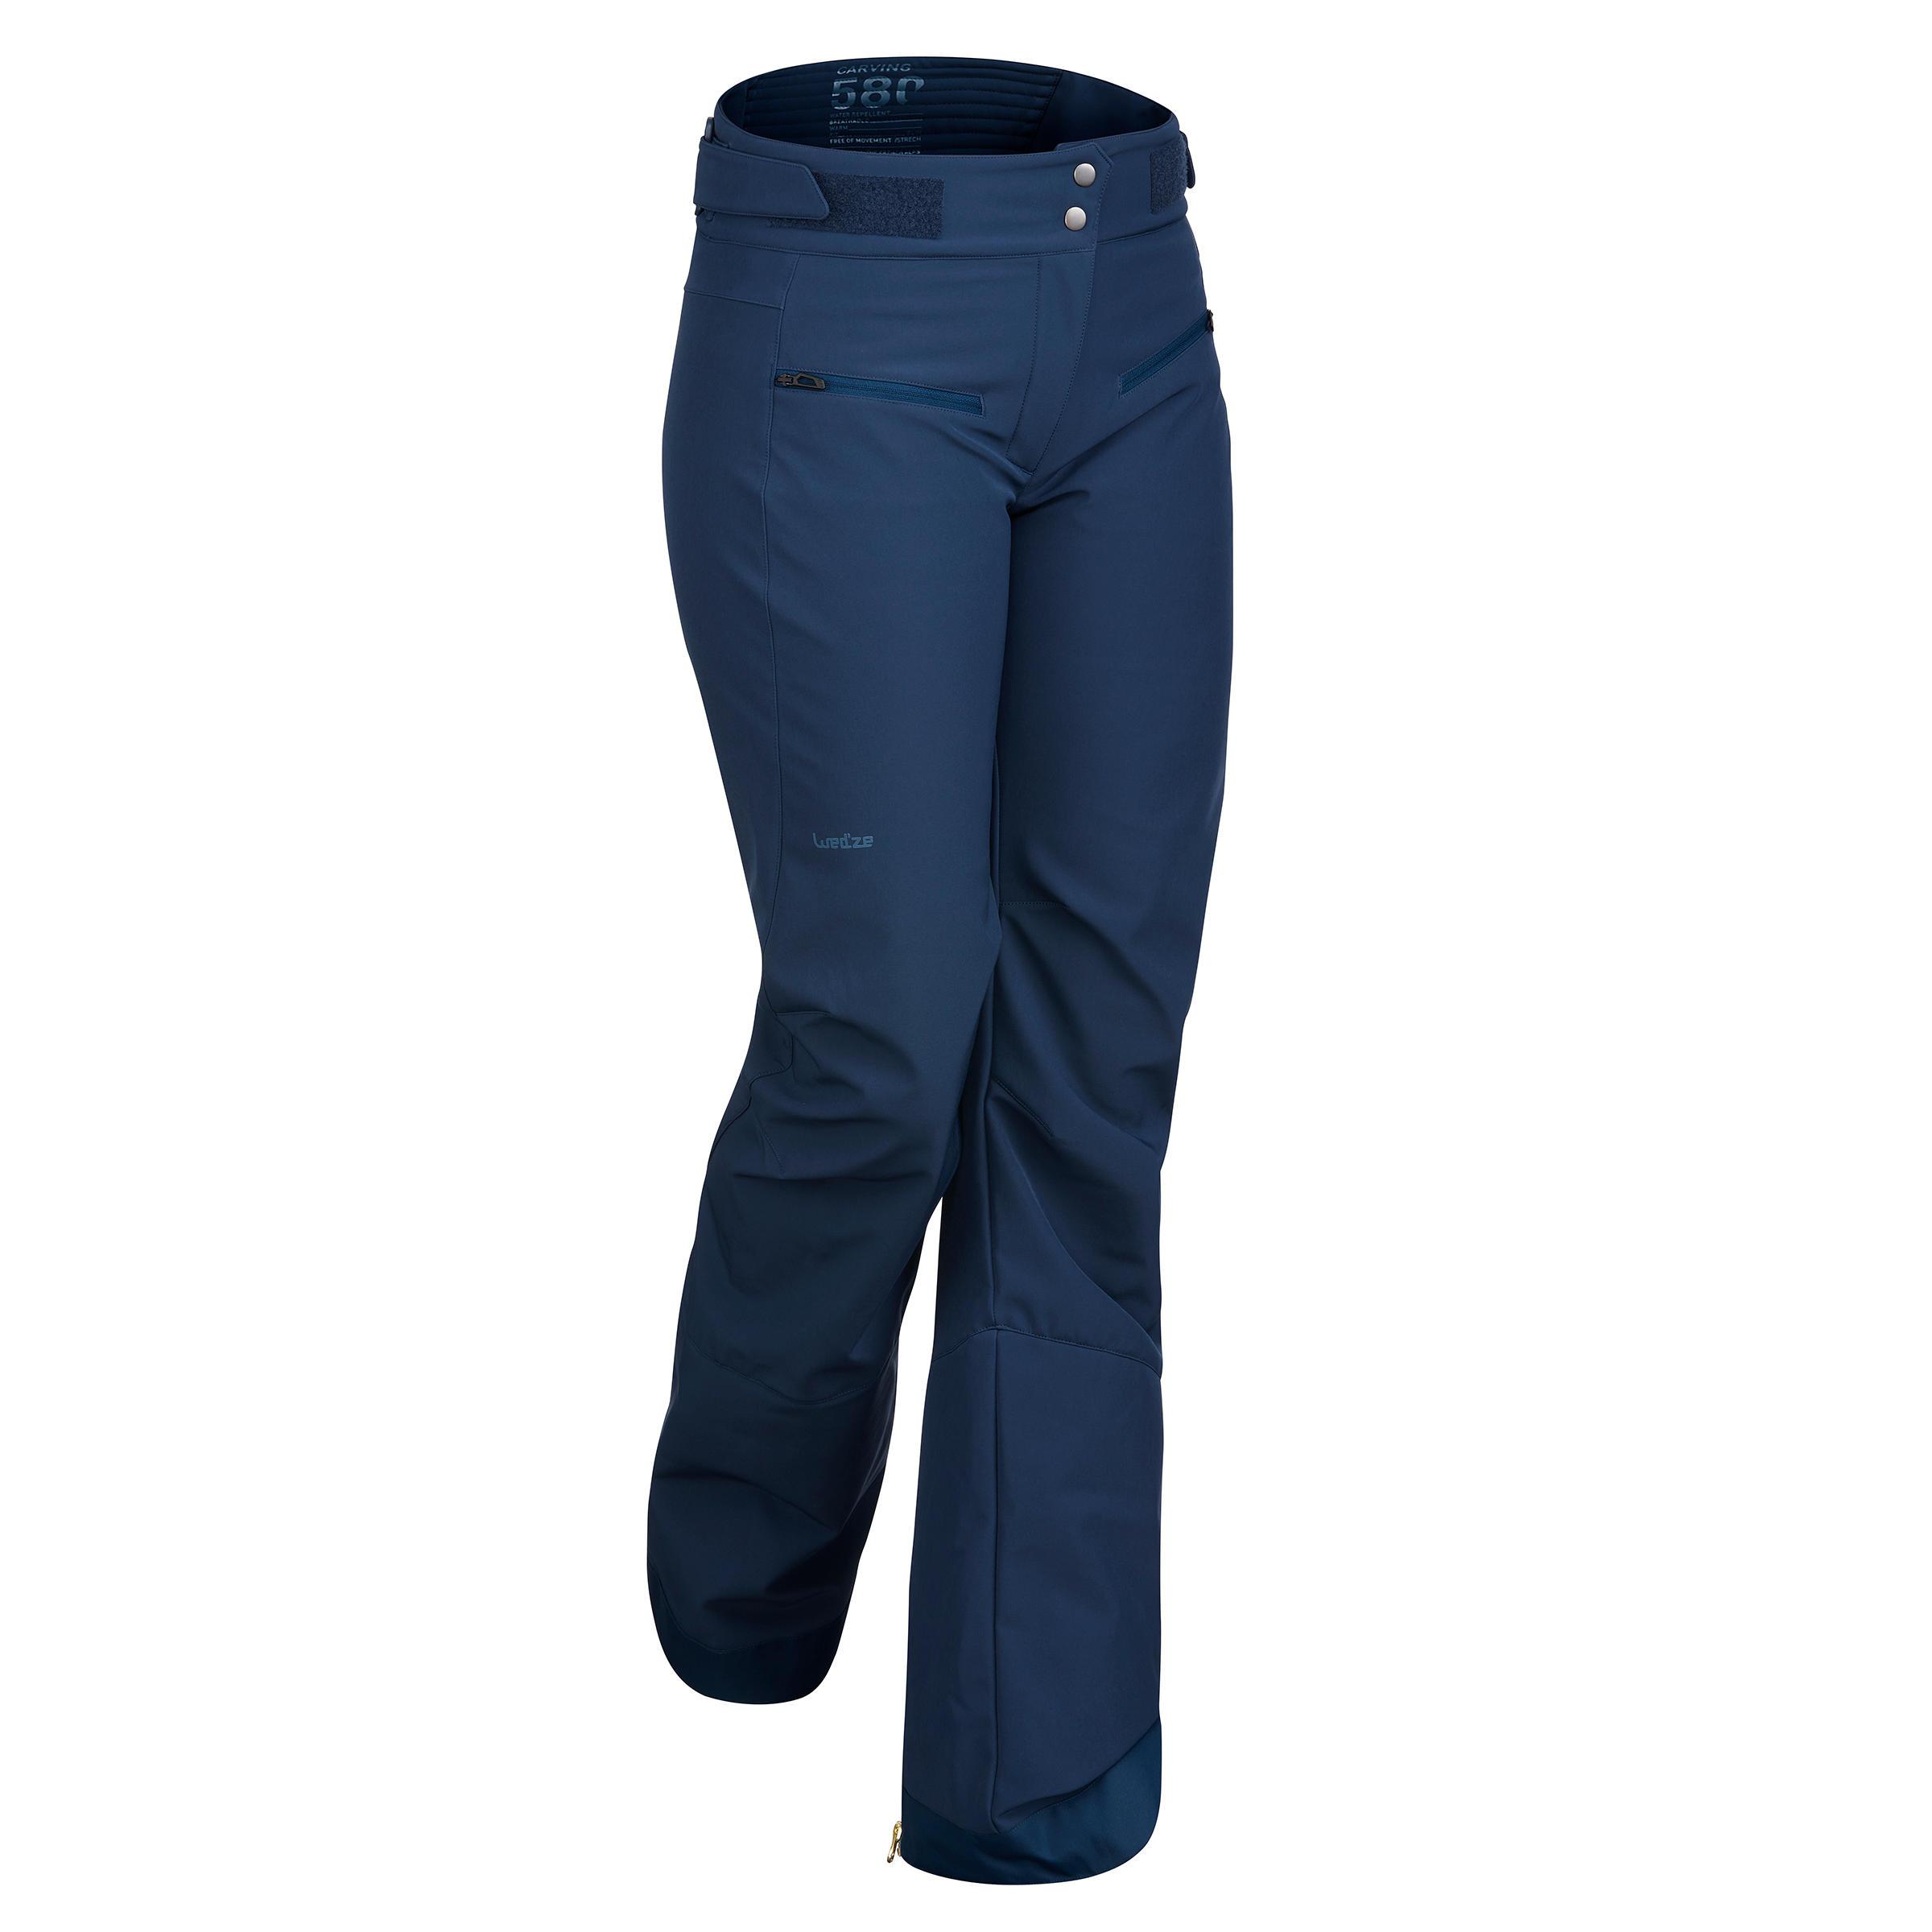 Skihose Piste PA 580 Slim Damen   Sportbekleidung > Sporthosen > Skihosen   Wedze